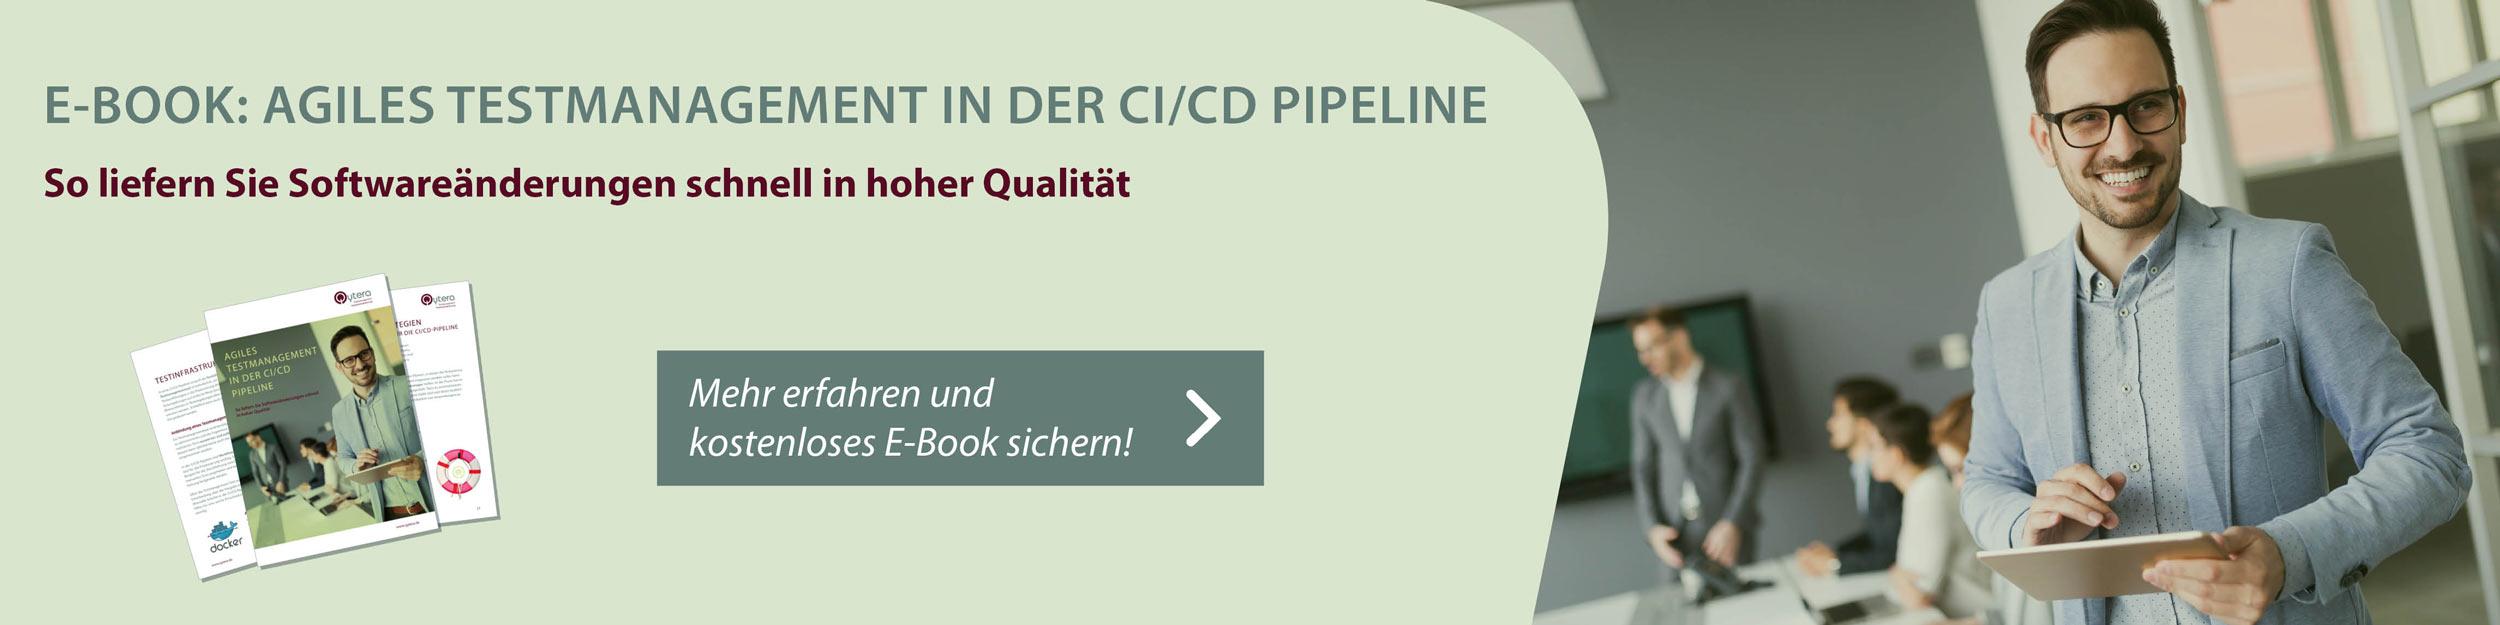 Kostenloses E-Book Agiles Testmanagement in der CI/CD Pipeline